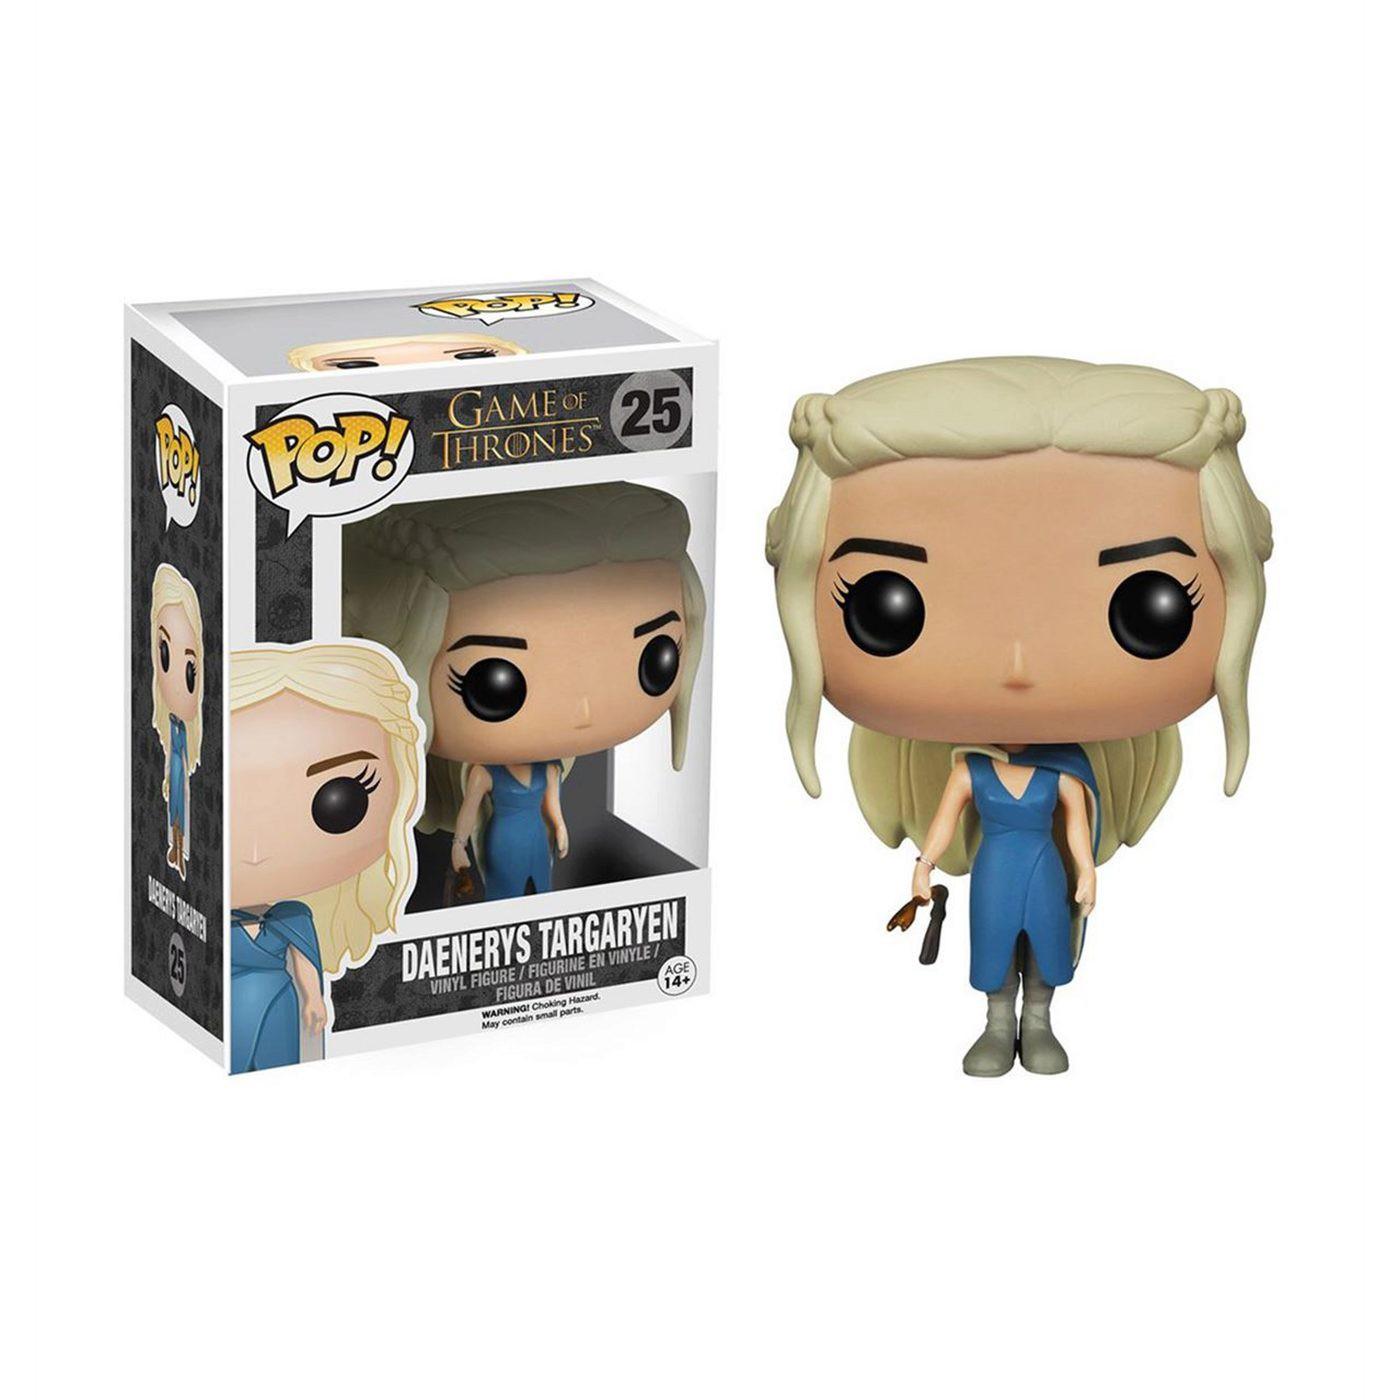 GOT Daenerys Targaryen Mother of Dragons Pop Vinyl